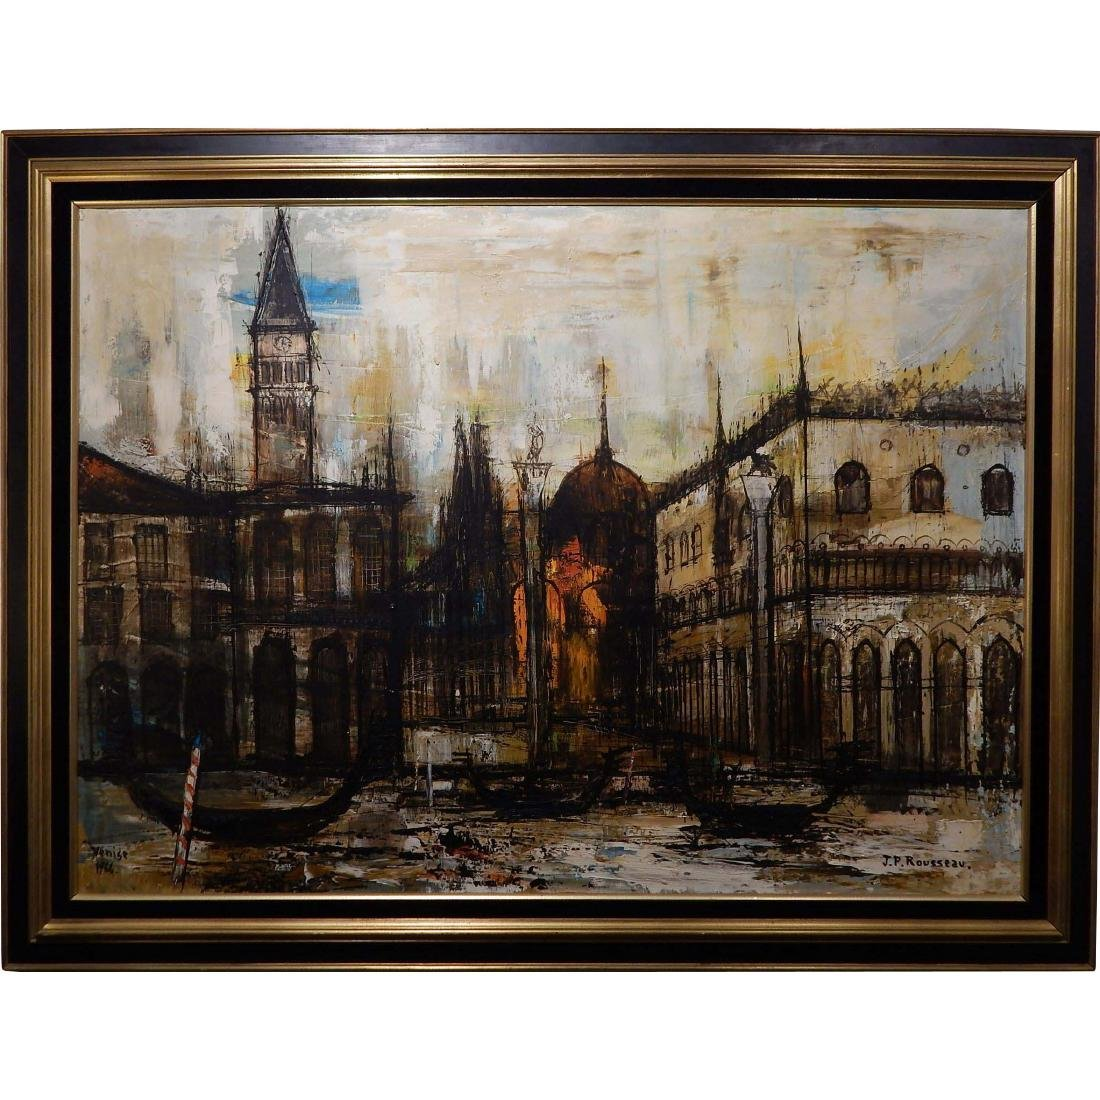 Jean Pierre Rousseau 1966 Oil Painting Of Venice